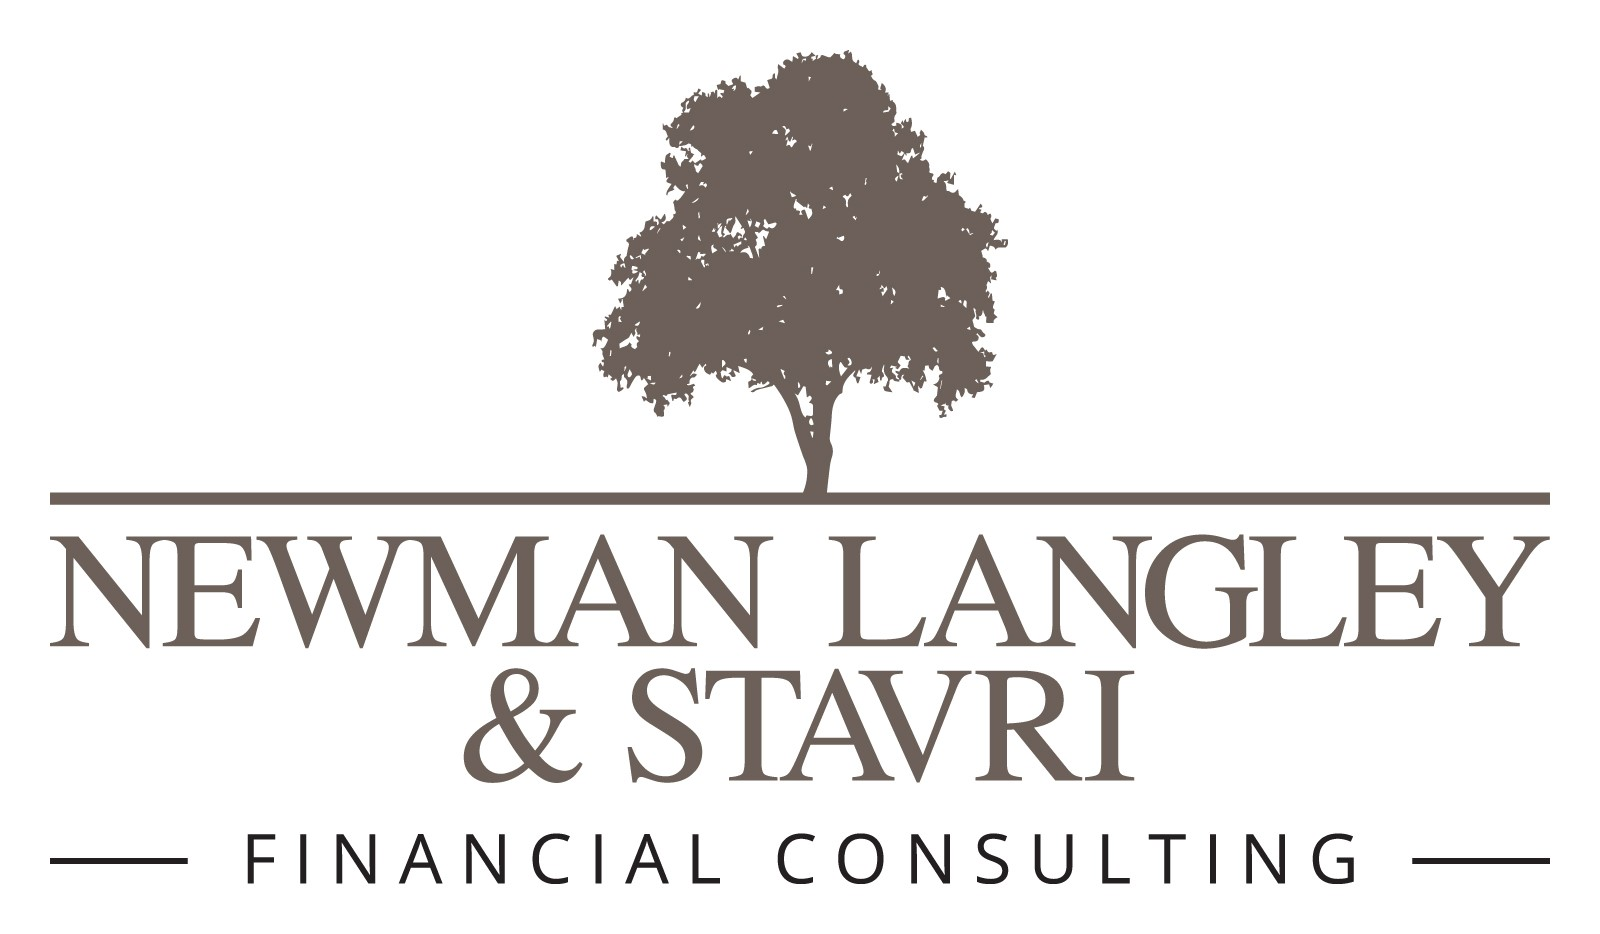 Newman langley & stavri